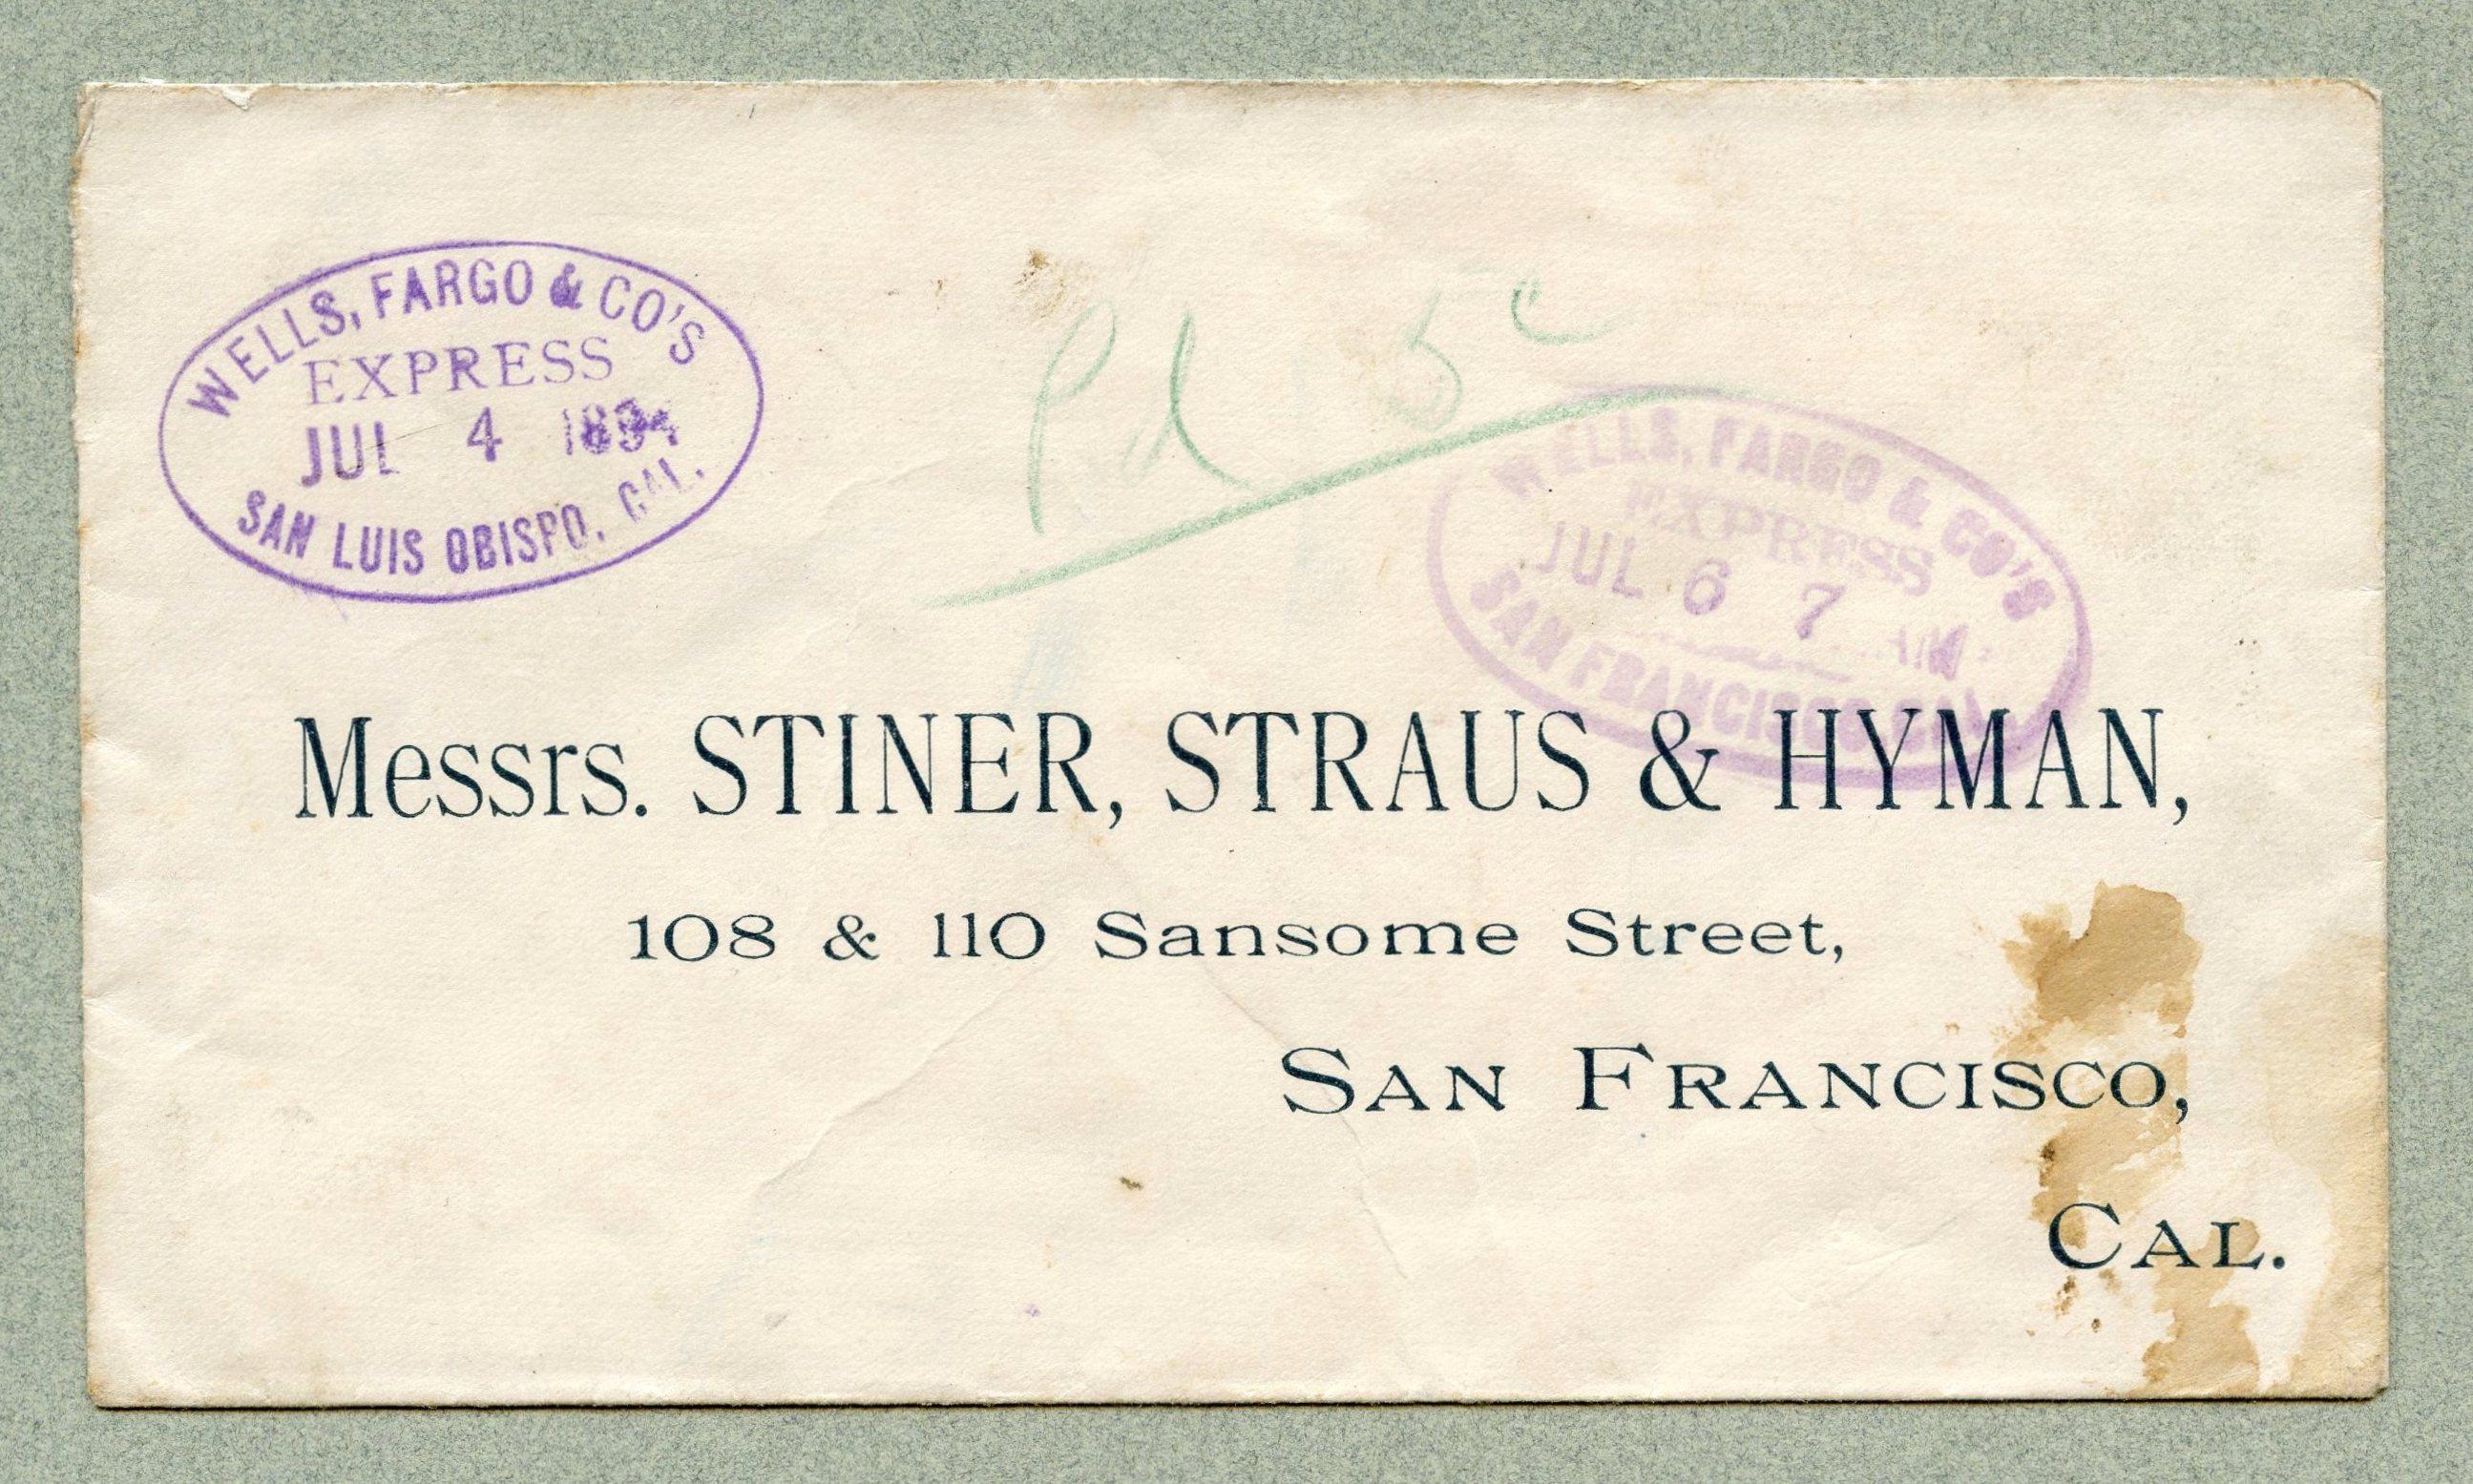 RR Strike 1894 Jul 04 San Luis Obispo